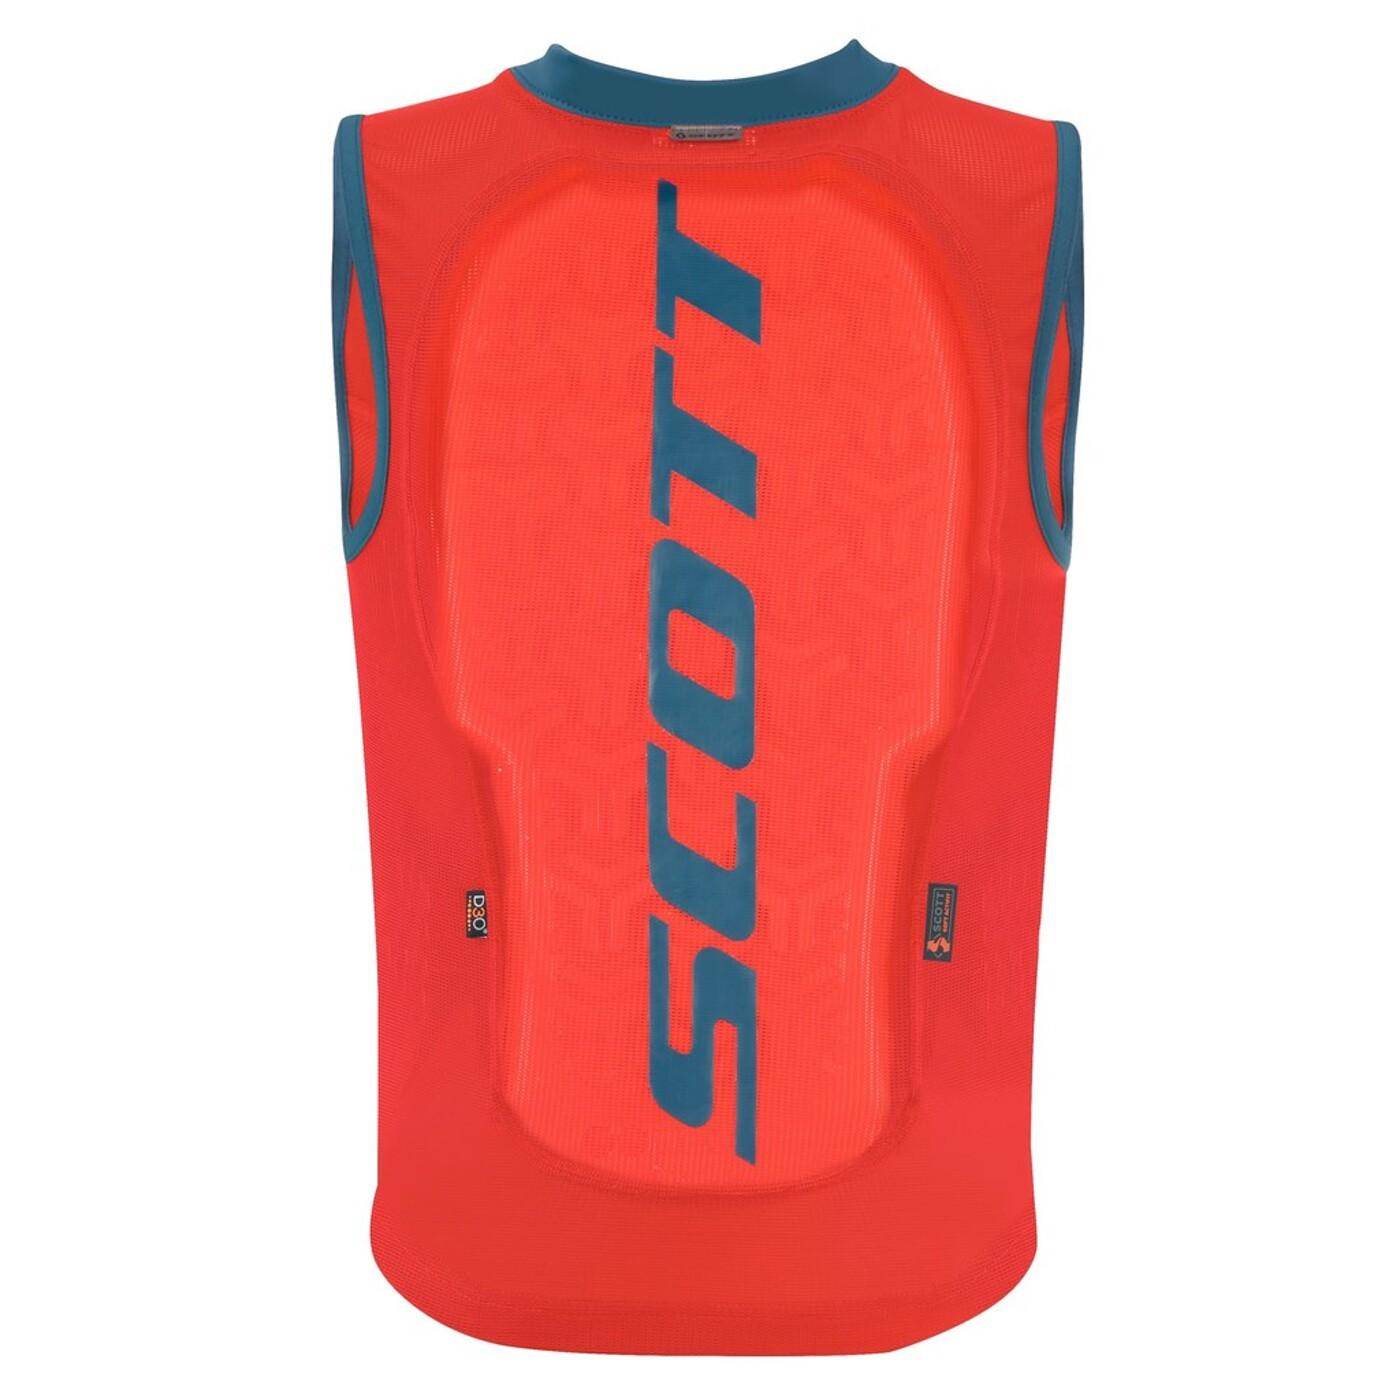 Protector SCO Vest Protector Jr Actifit Plus Scott